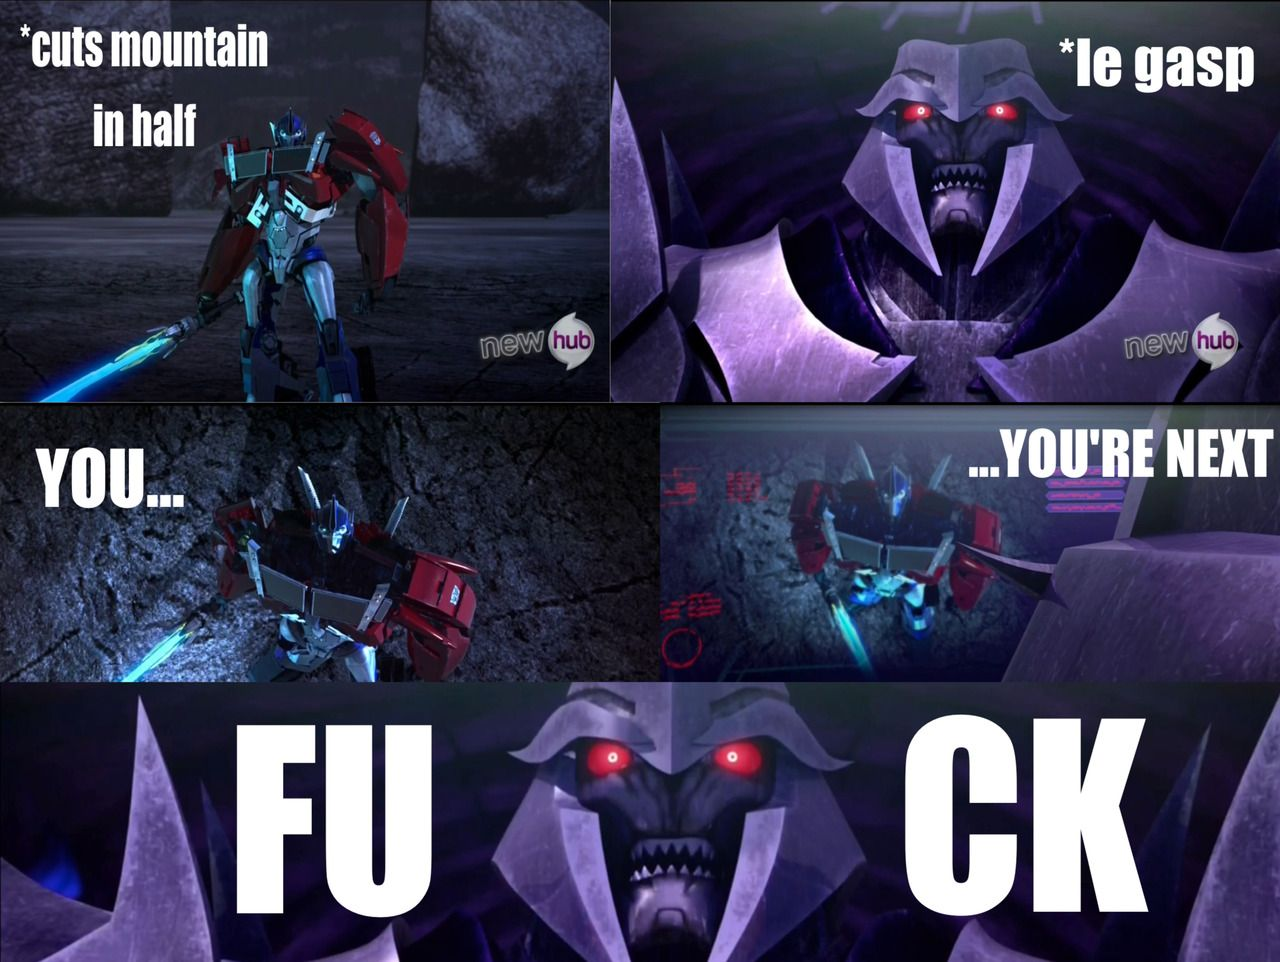 transformers prime meet megatron pics